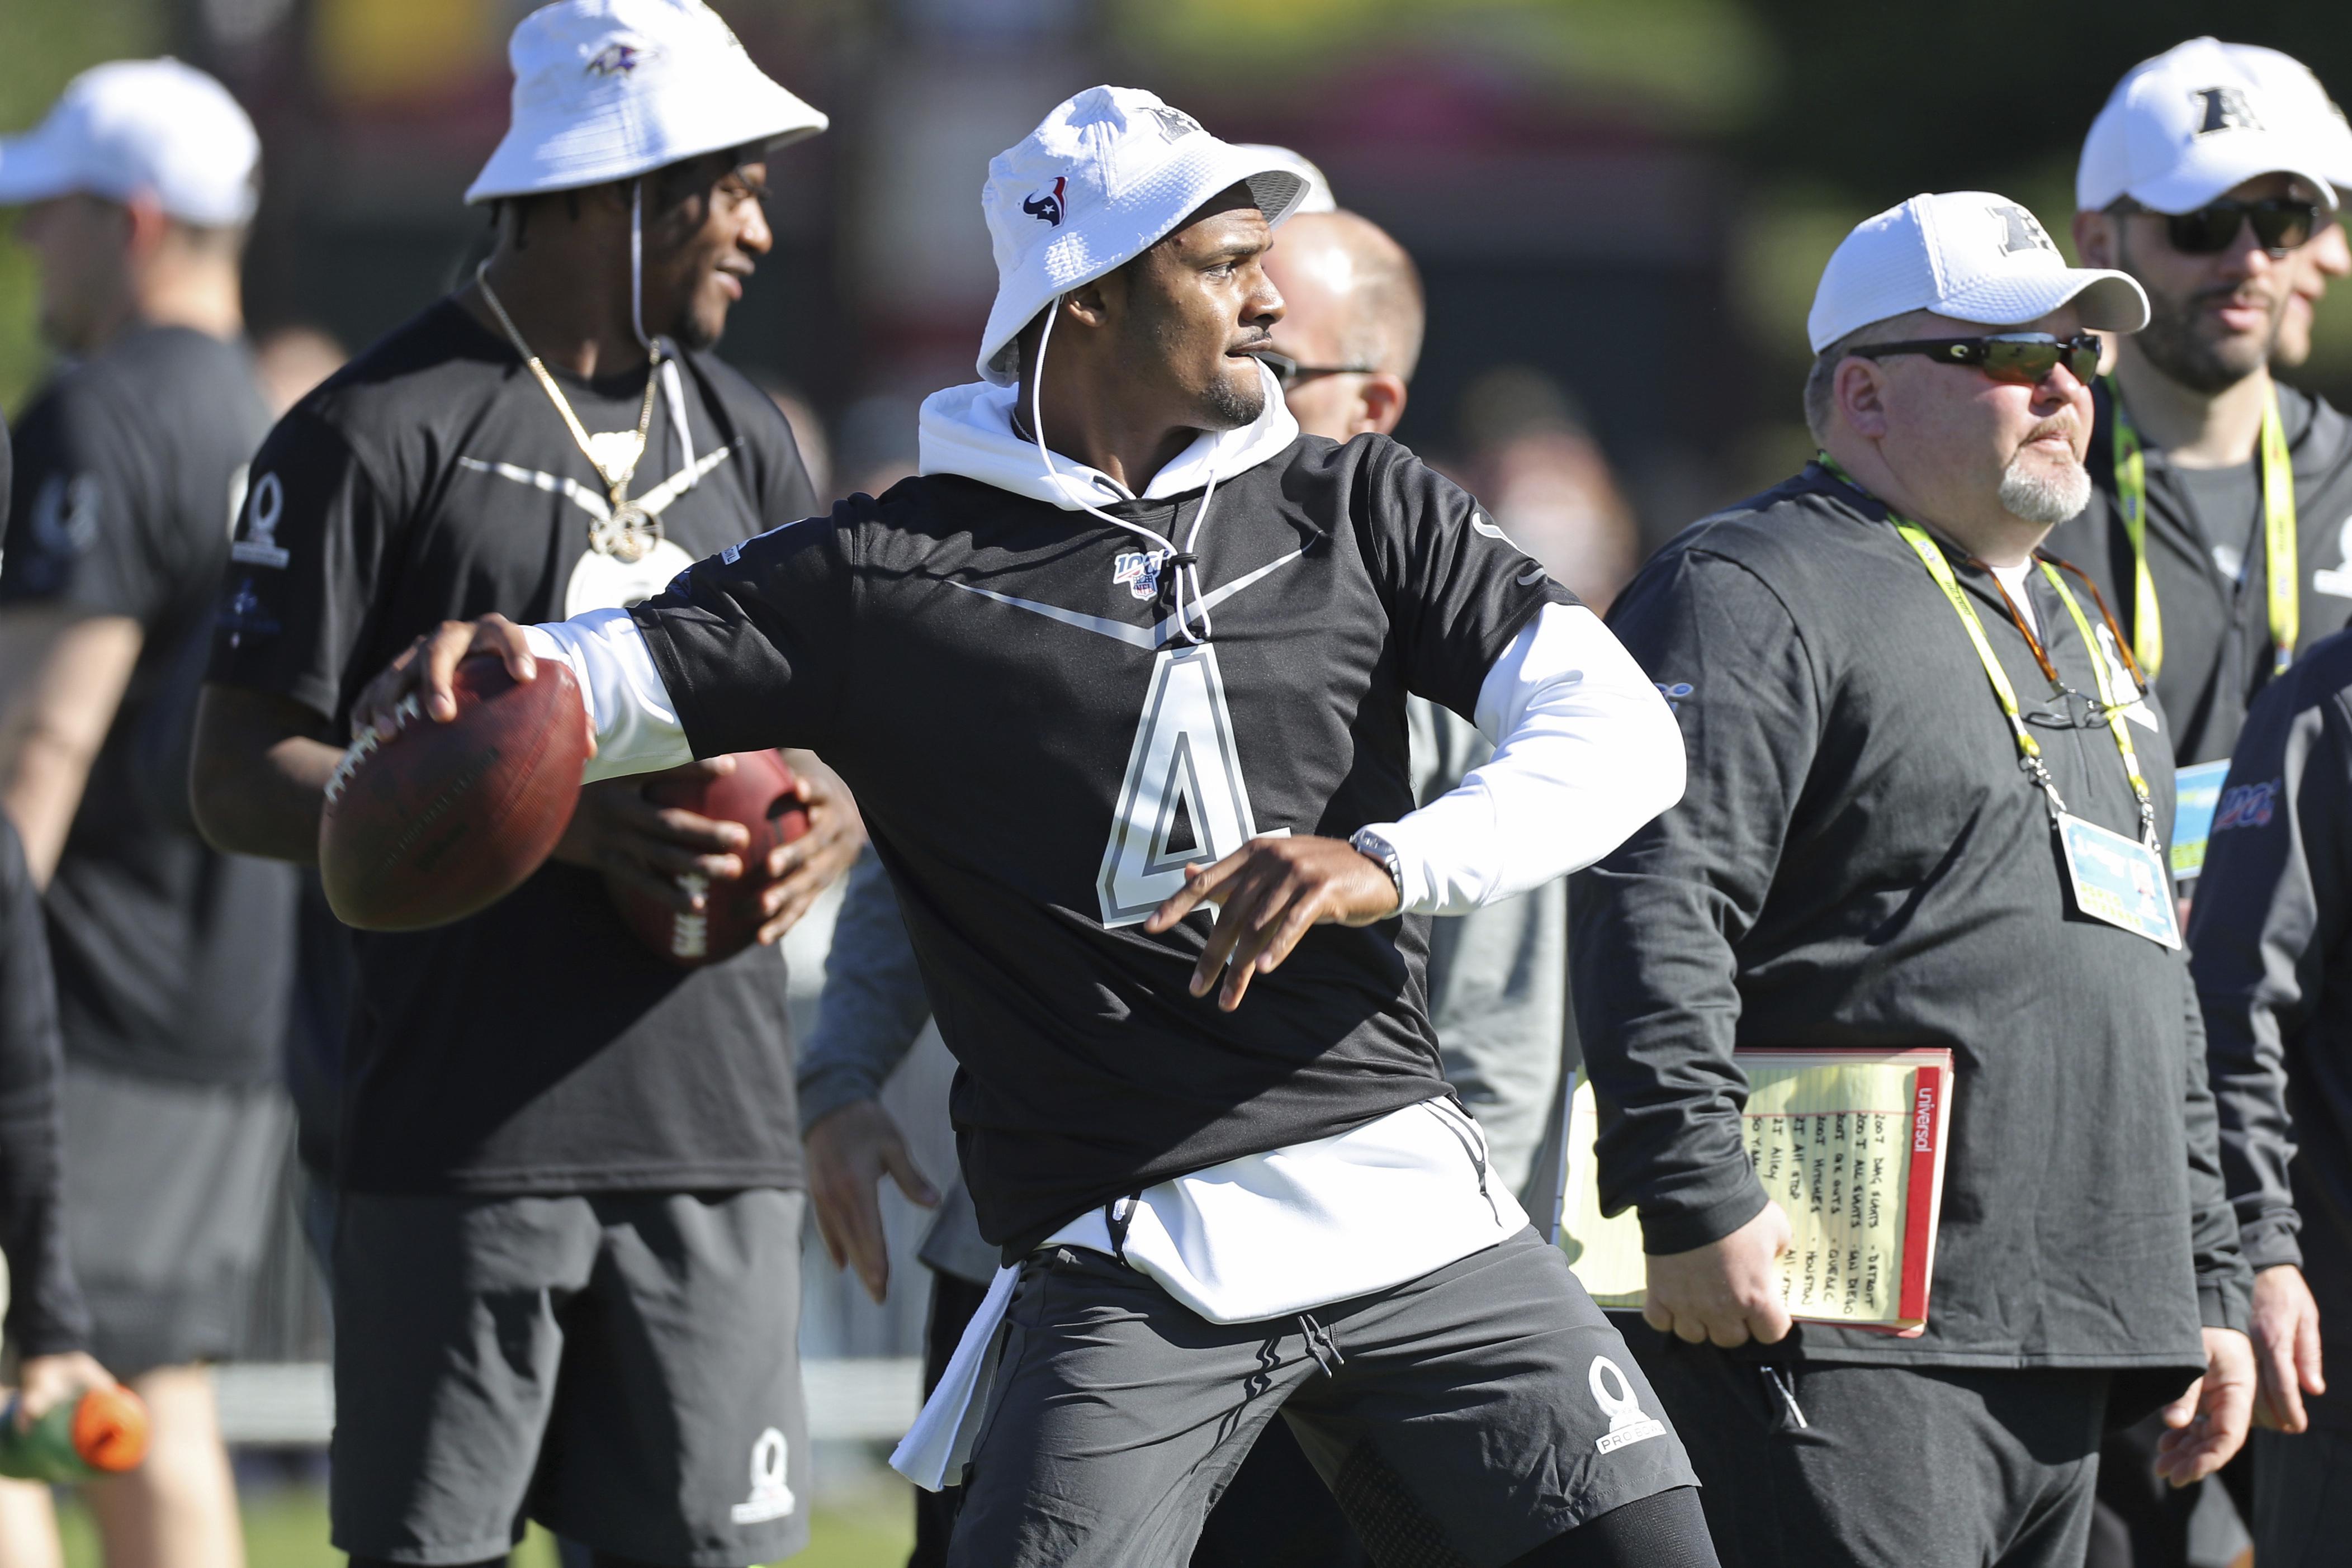 Texans quarterback Deshaun Watson throws a pass during Saturday's Pro Bowl practice.